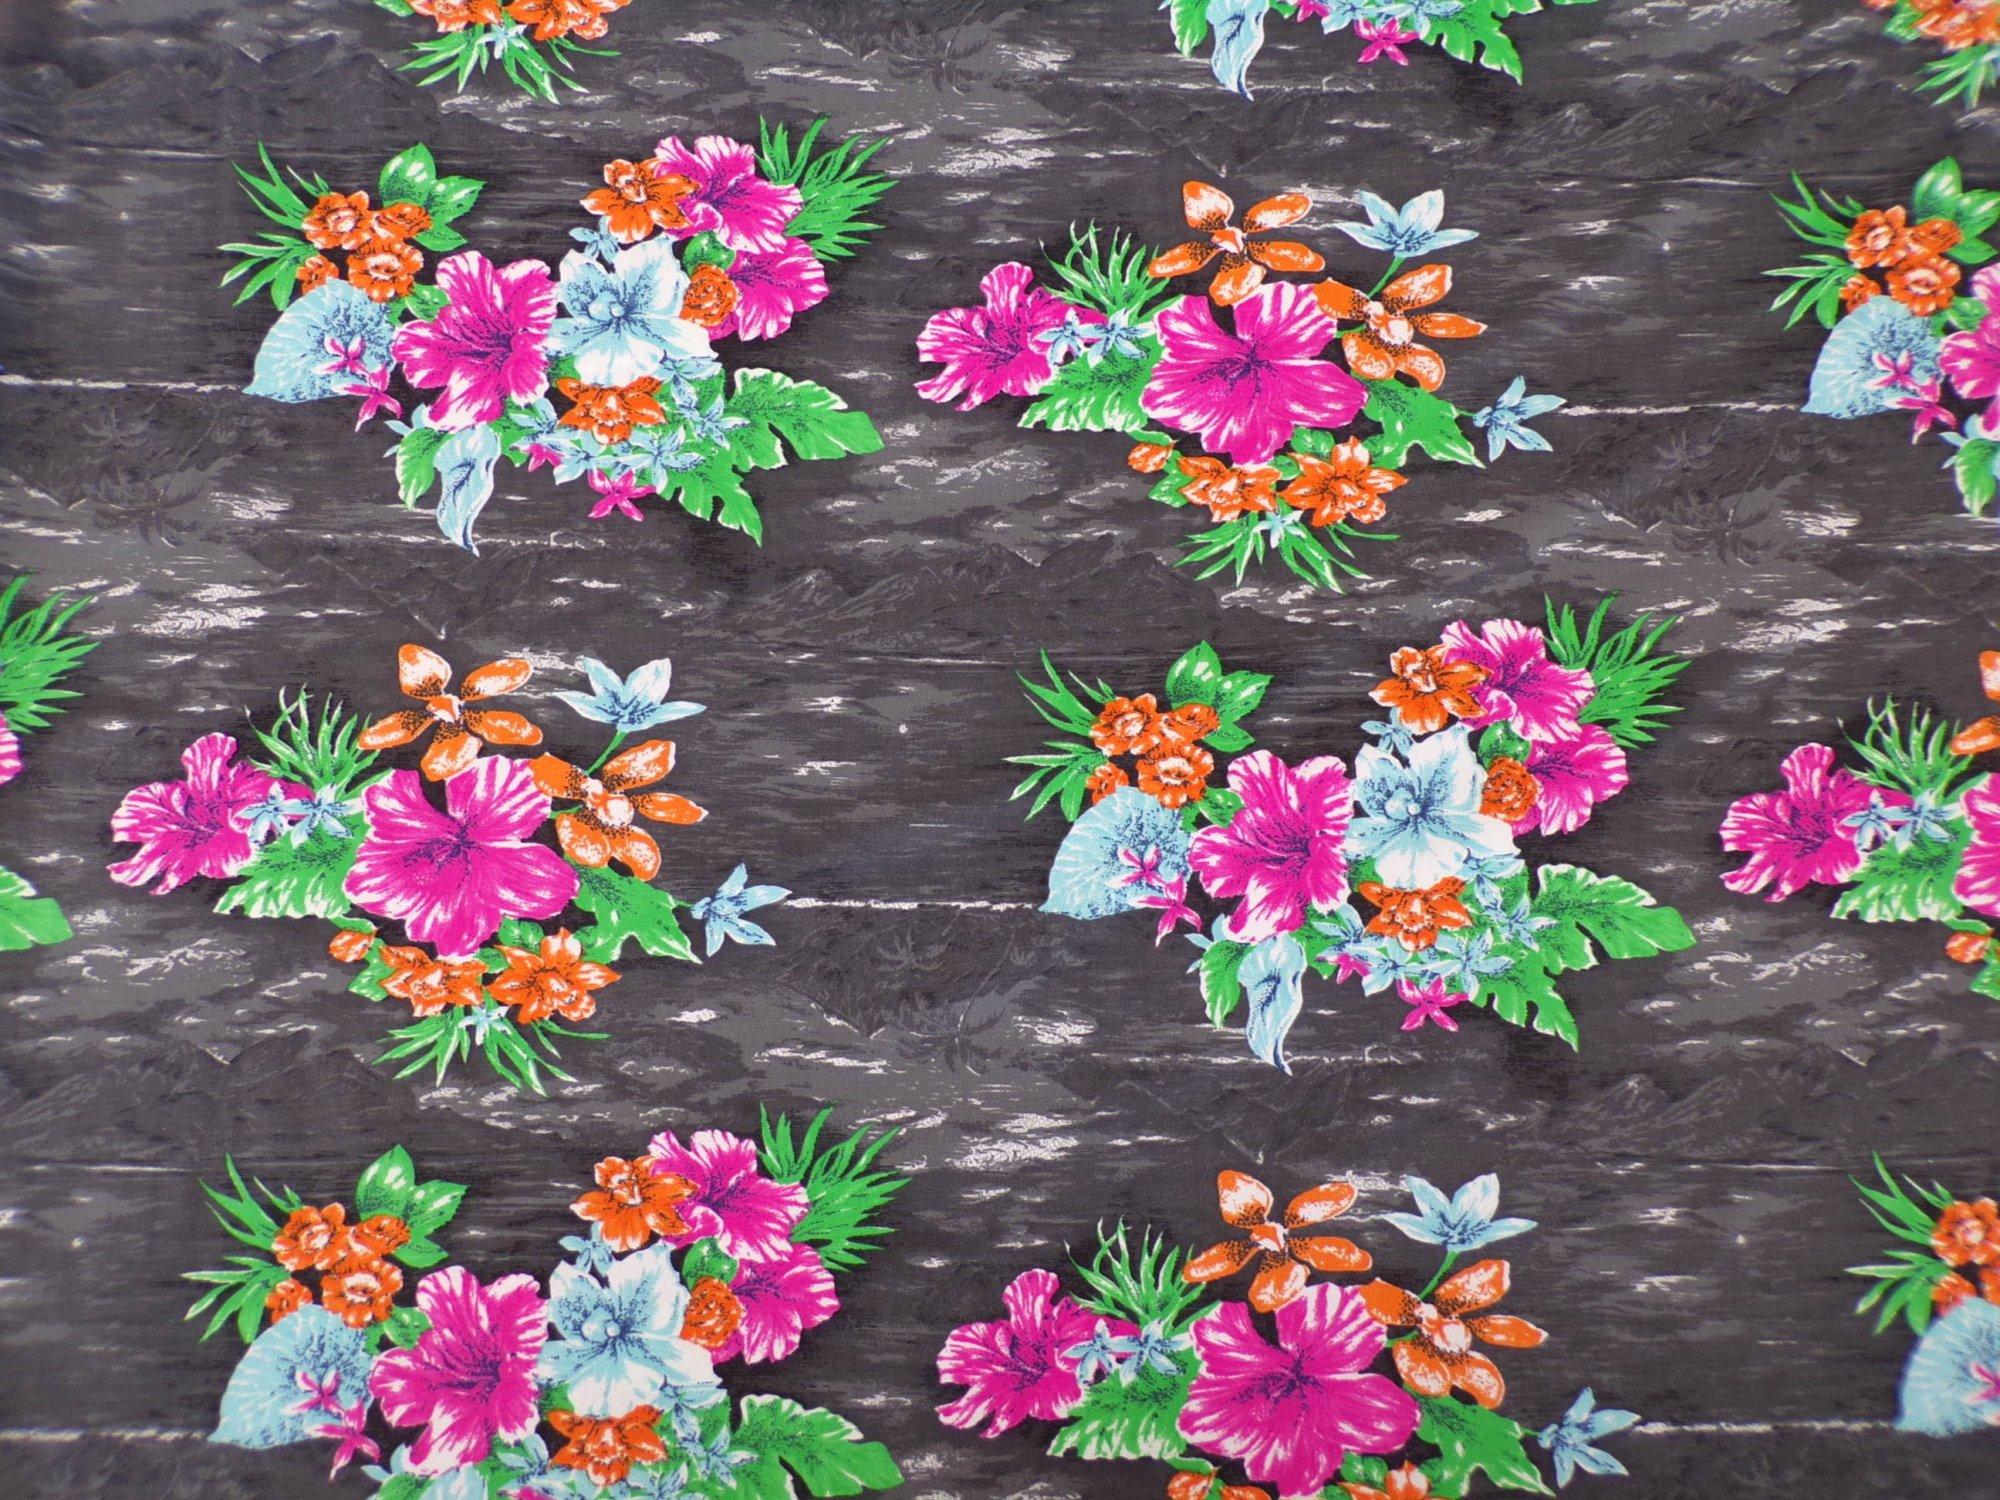 Nylon Lycra Swimwear - Gray Floral